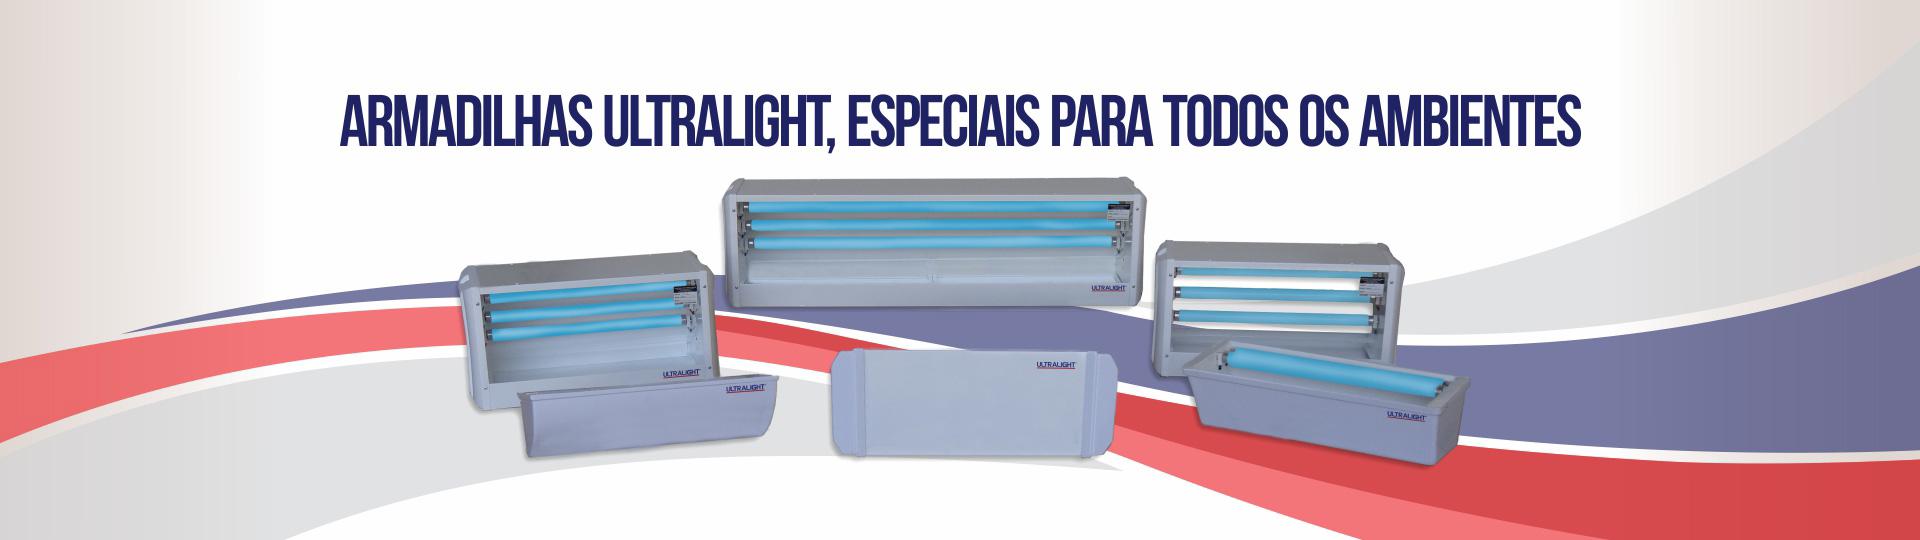 Armadilhas Ultralight